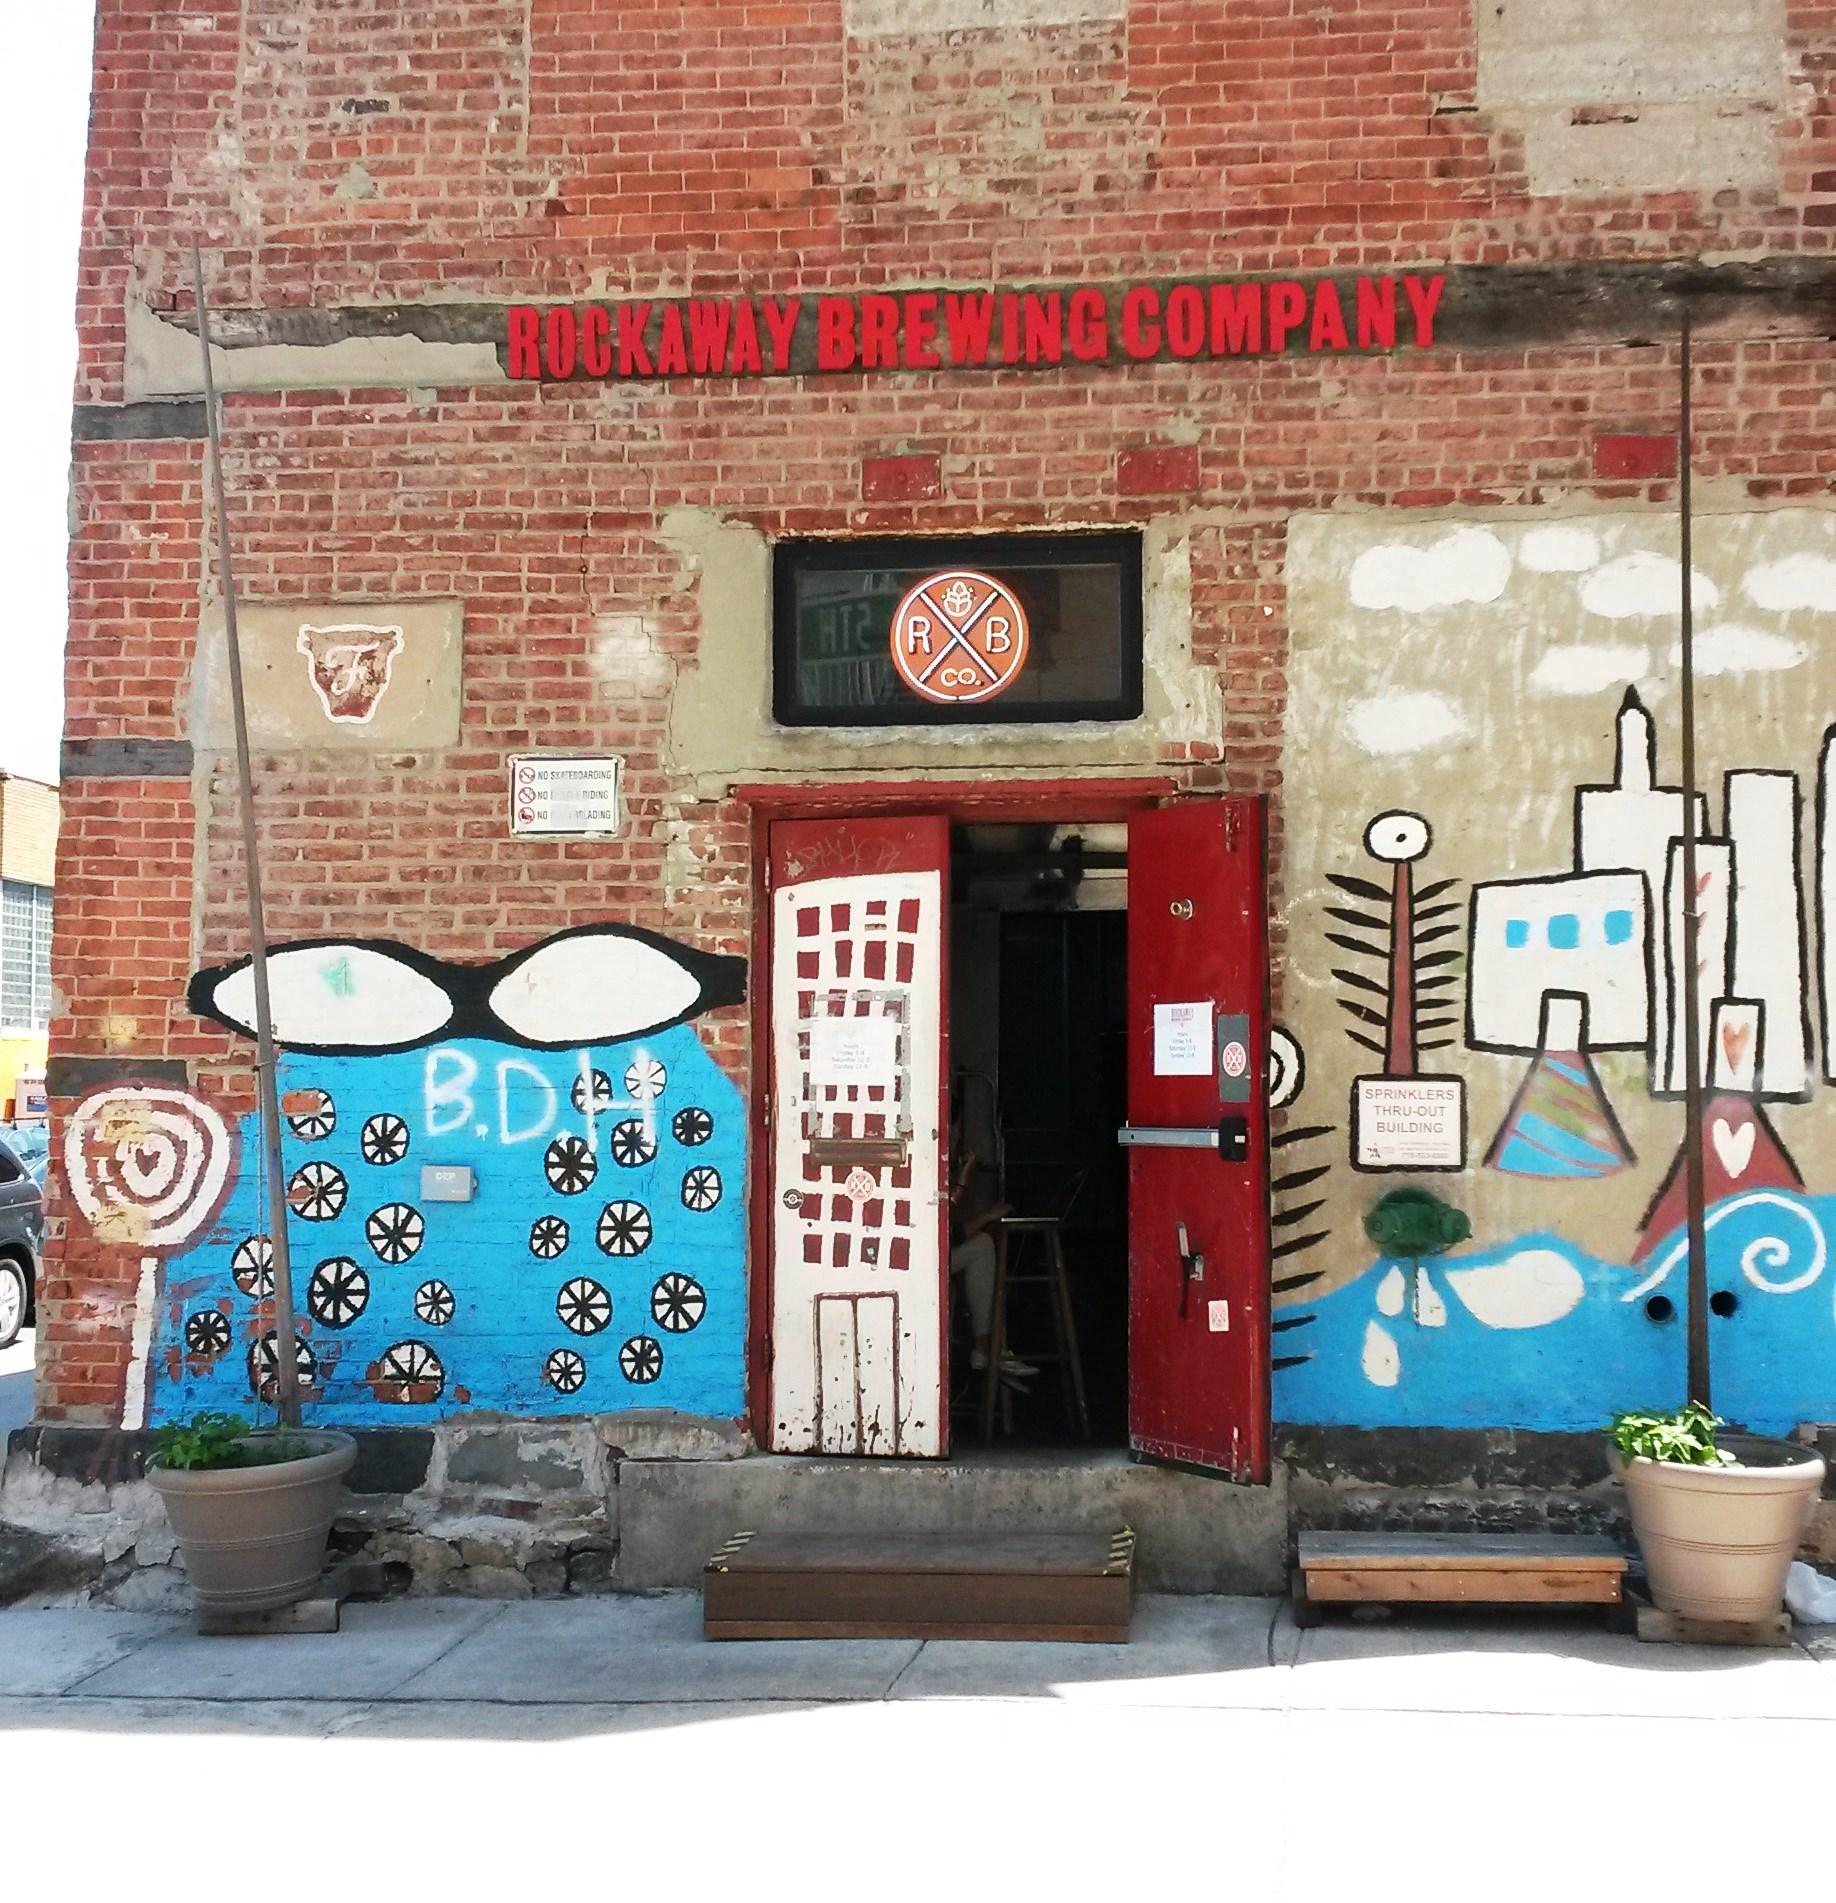 The Castle Rockaway_Rockaway Brewery